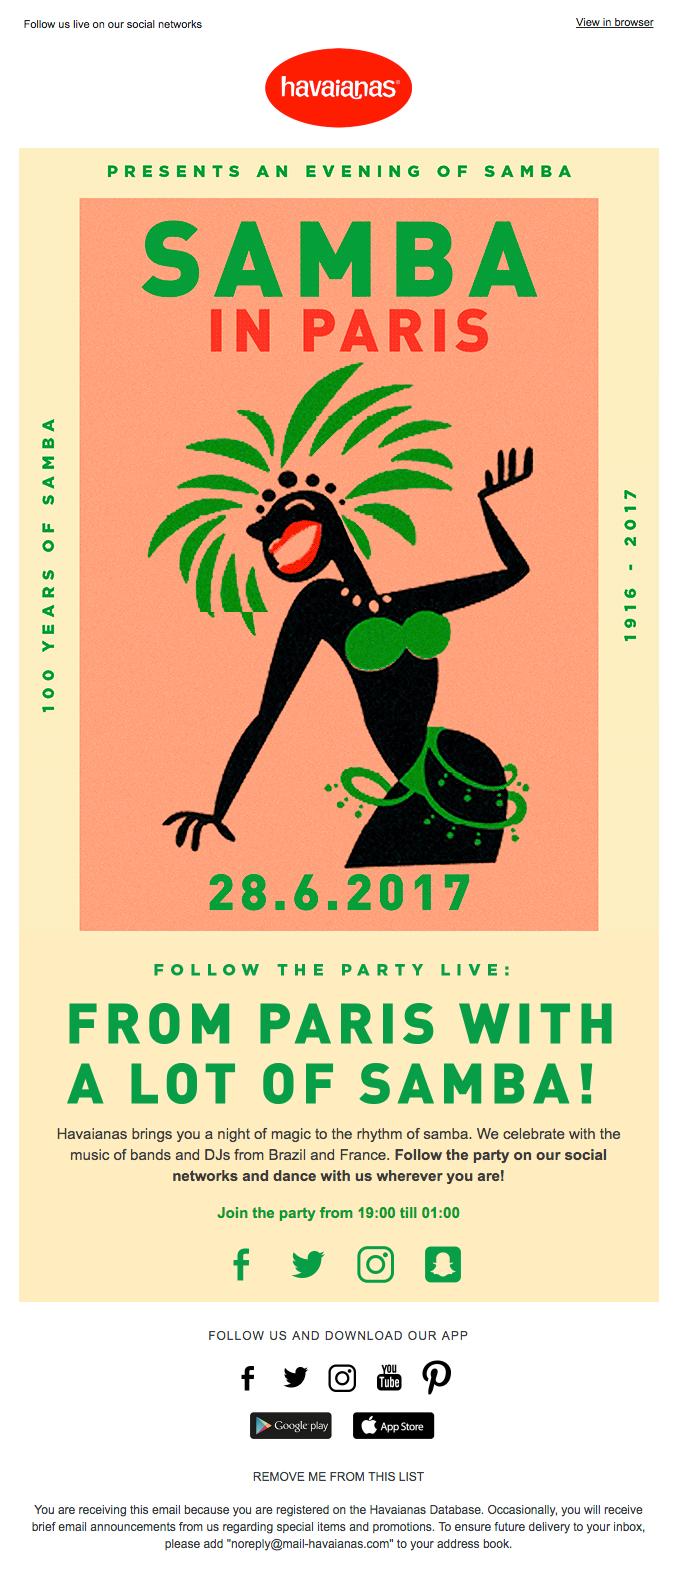 Havaianas invites you to its Samba in Paris event